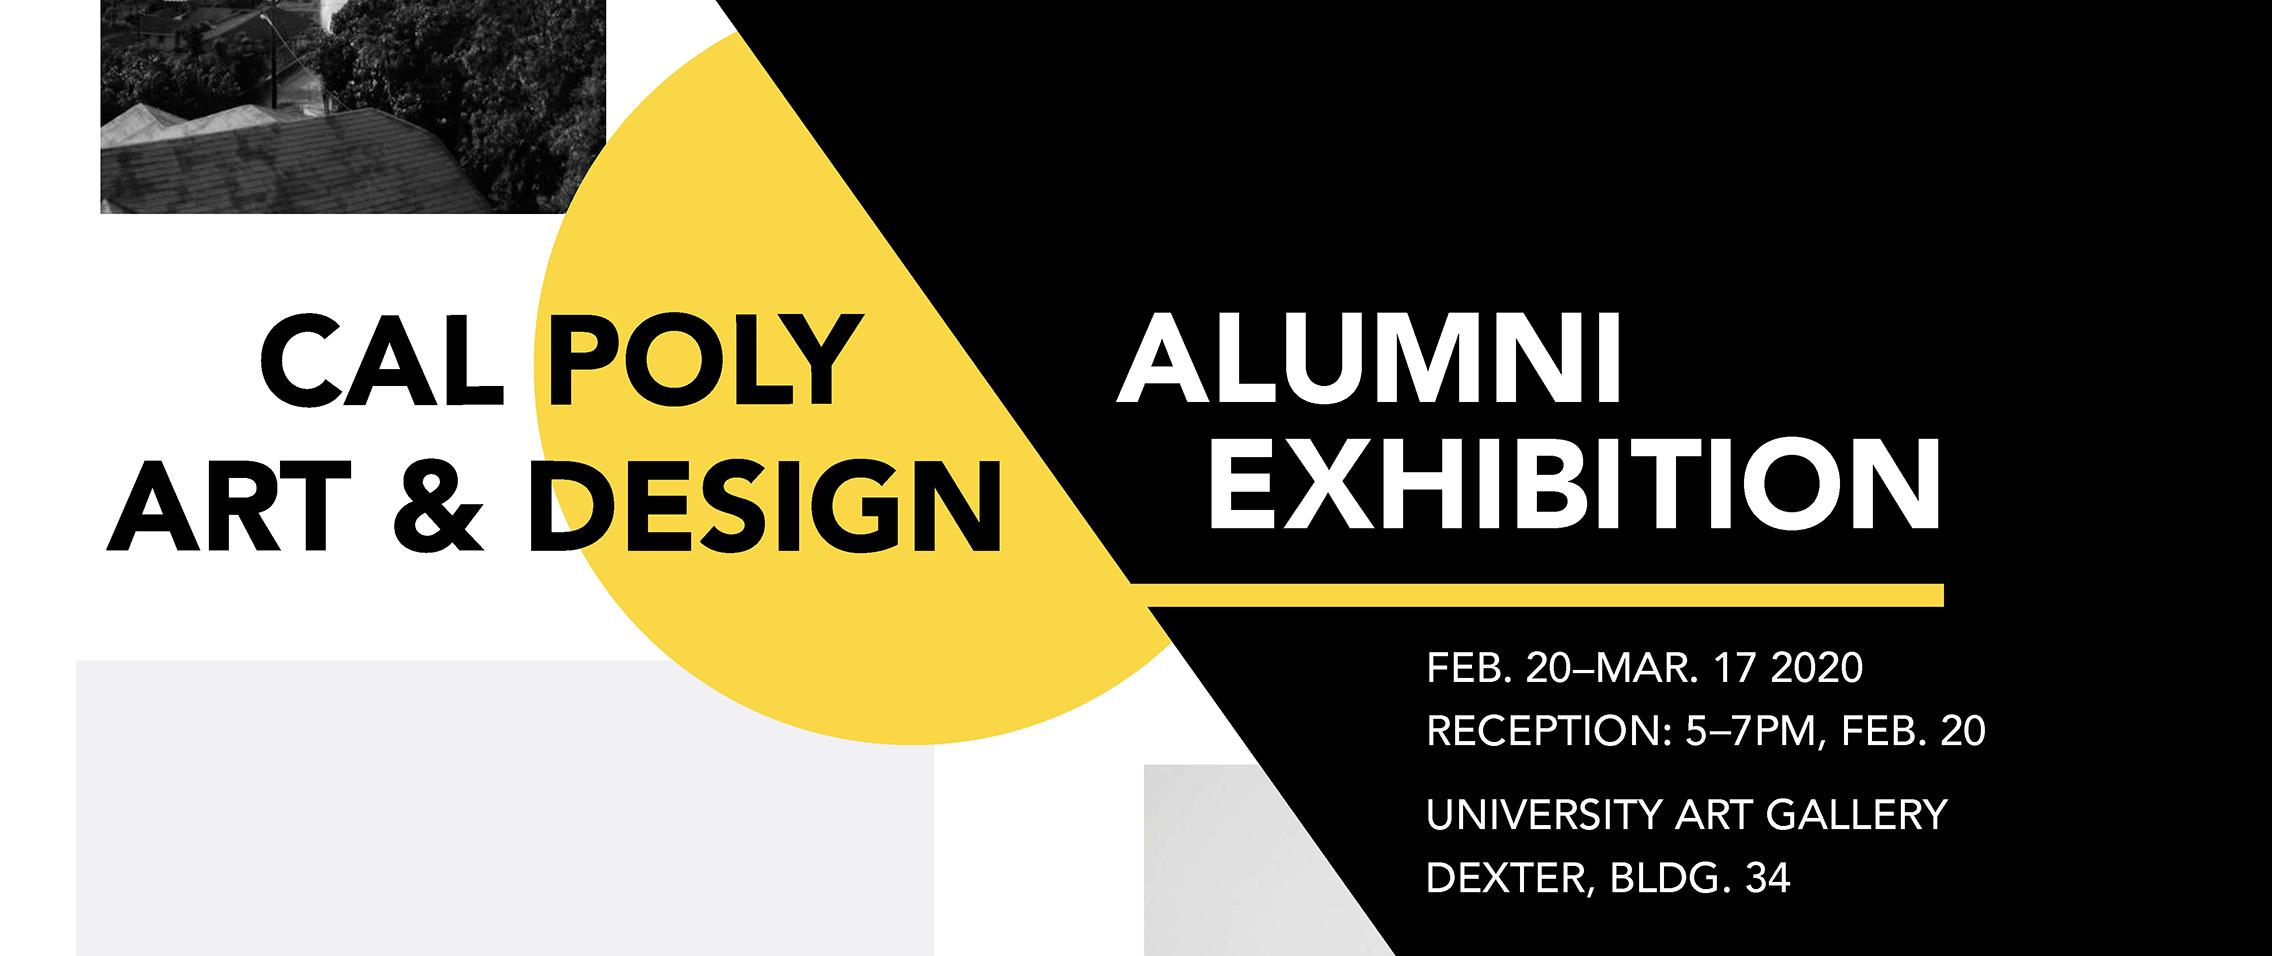 Cal Poly Alumni Exhibition